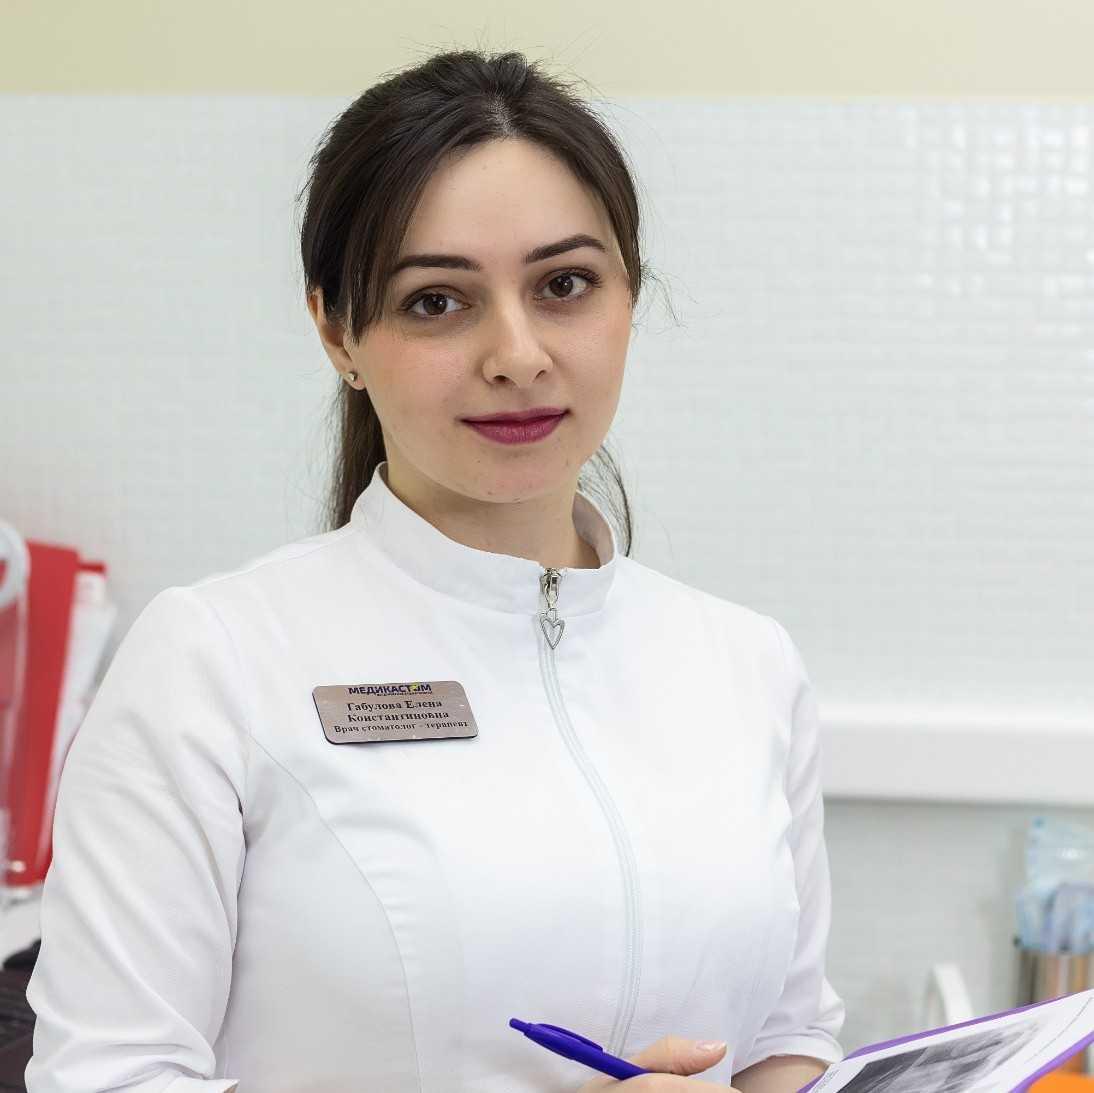 Габулова Елена Константиновна - фотография